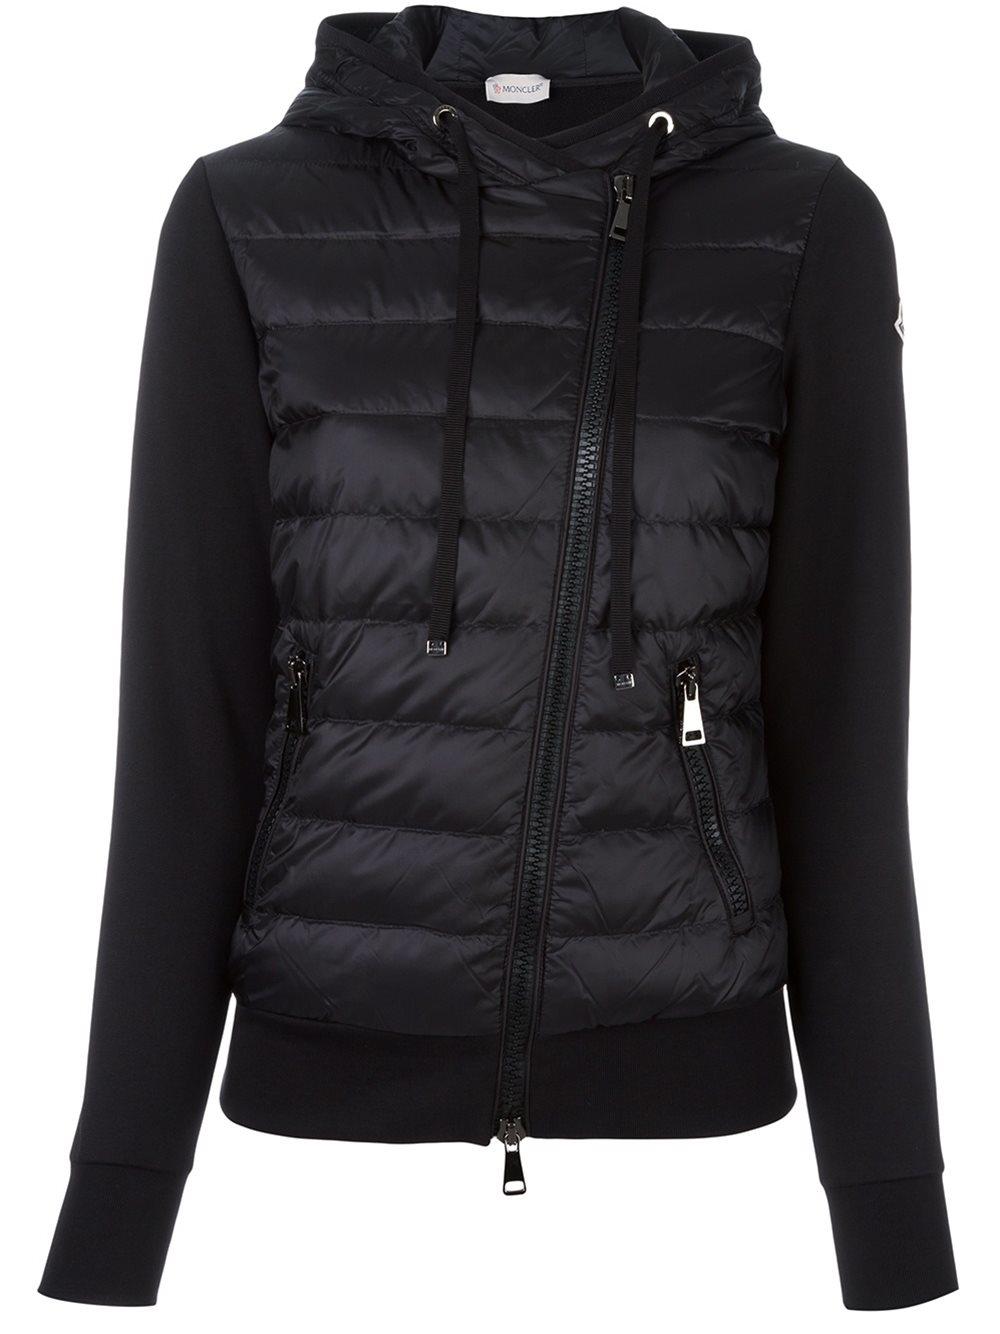 8c588cc500e Moncler Women's Fur-trimmed Hood gene Puffer Jacket in Black - Lyst